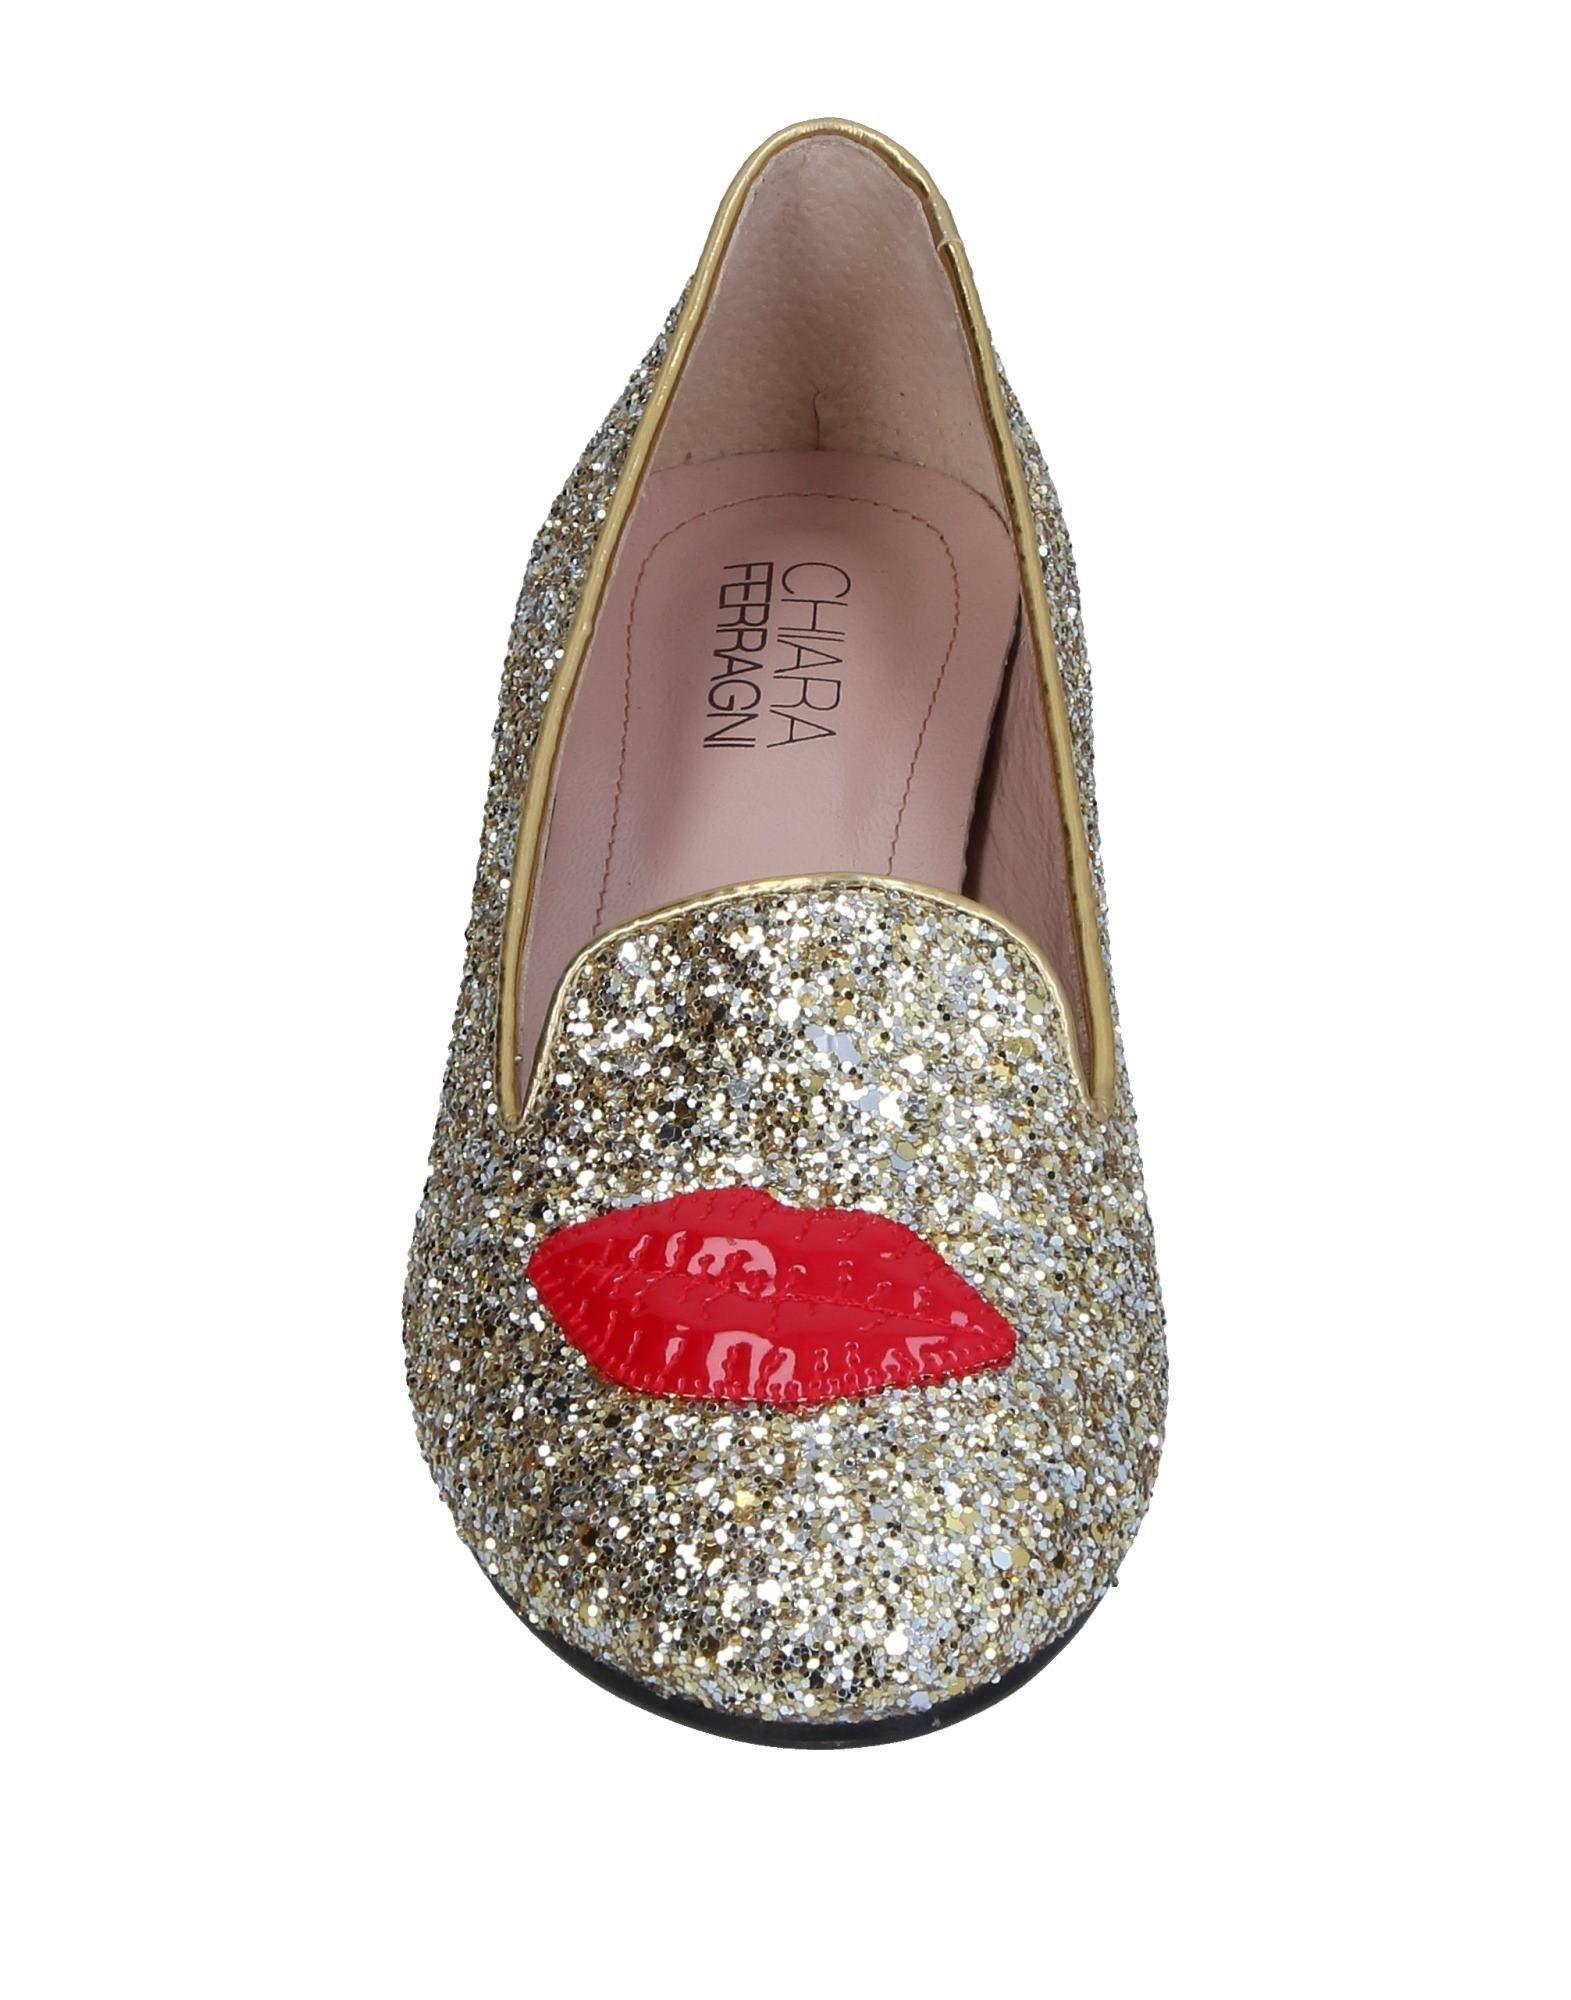 Chiara Ferragni Mokassins Damen  11366760EW Gute Qualität beliebte Schuhe